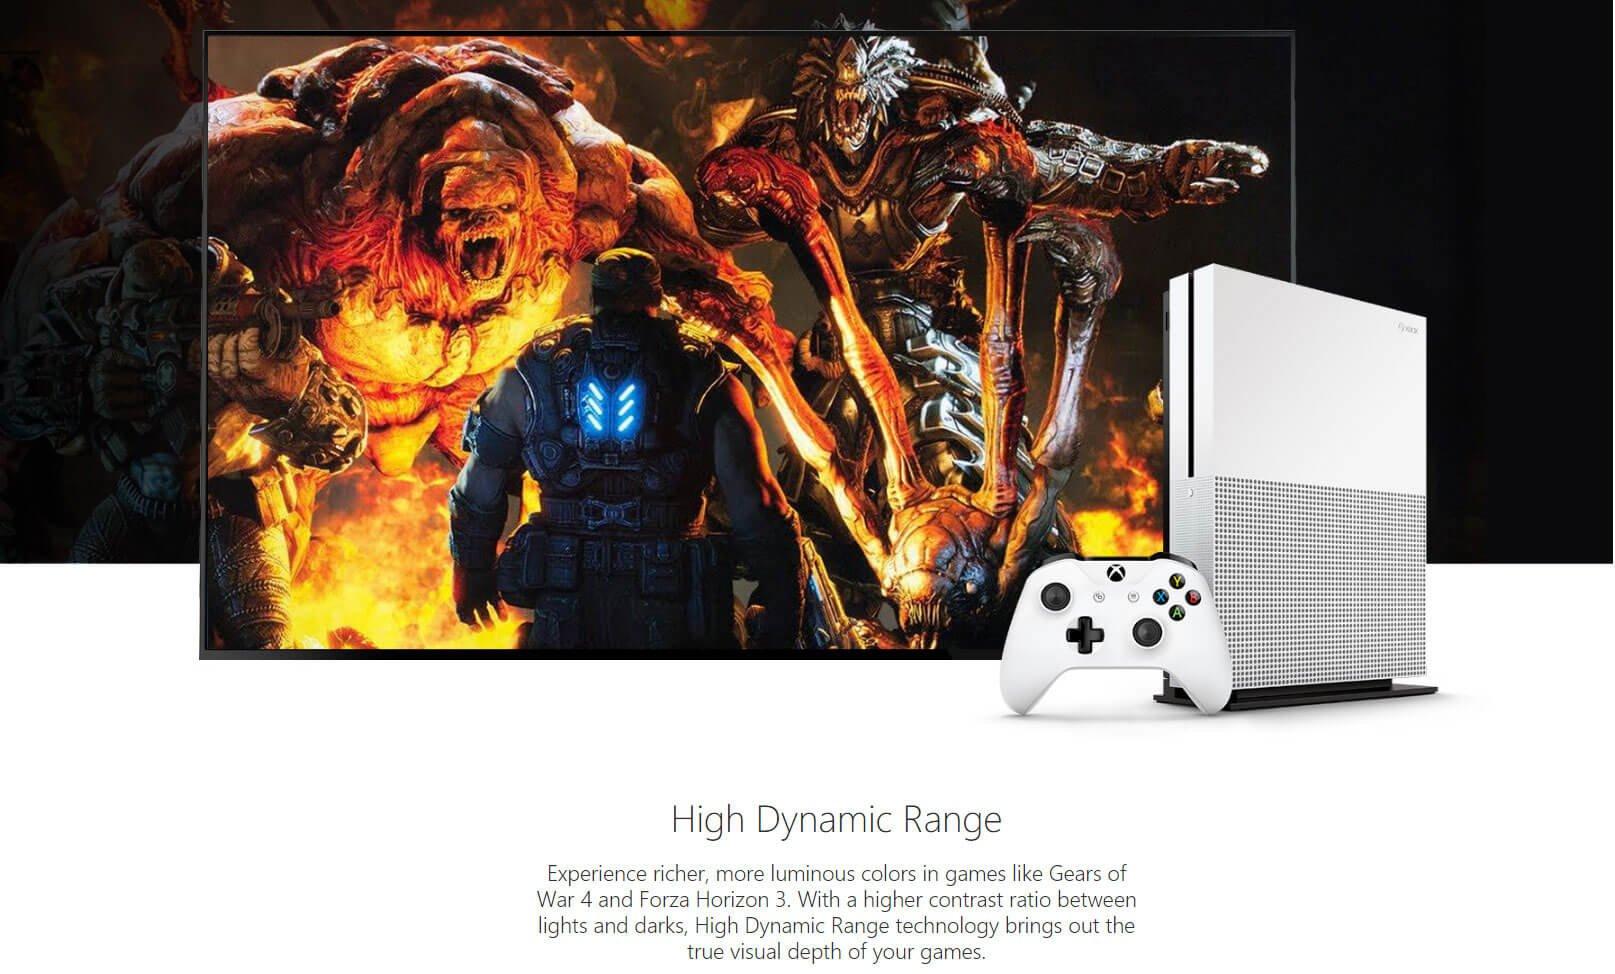 Xbox-S-HDR